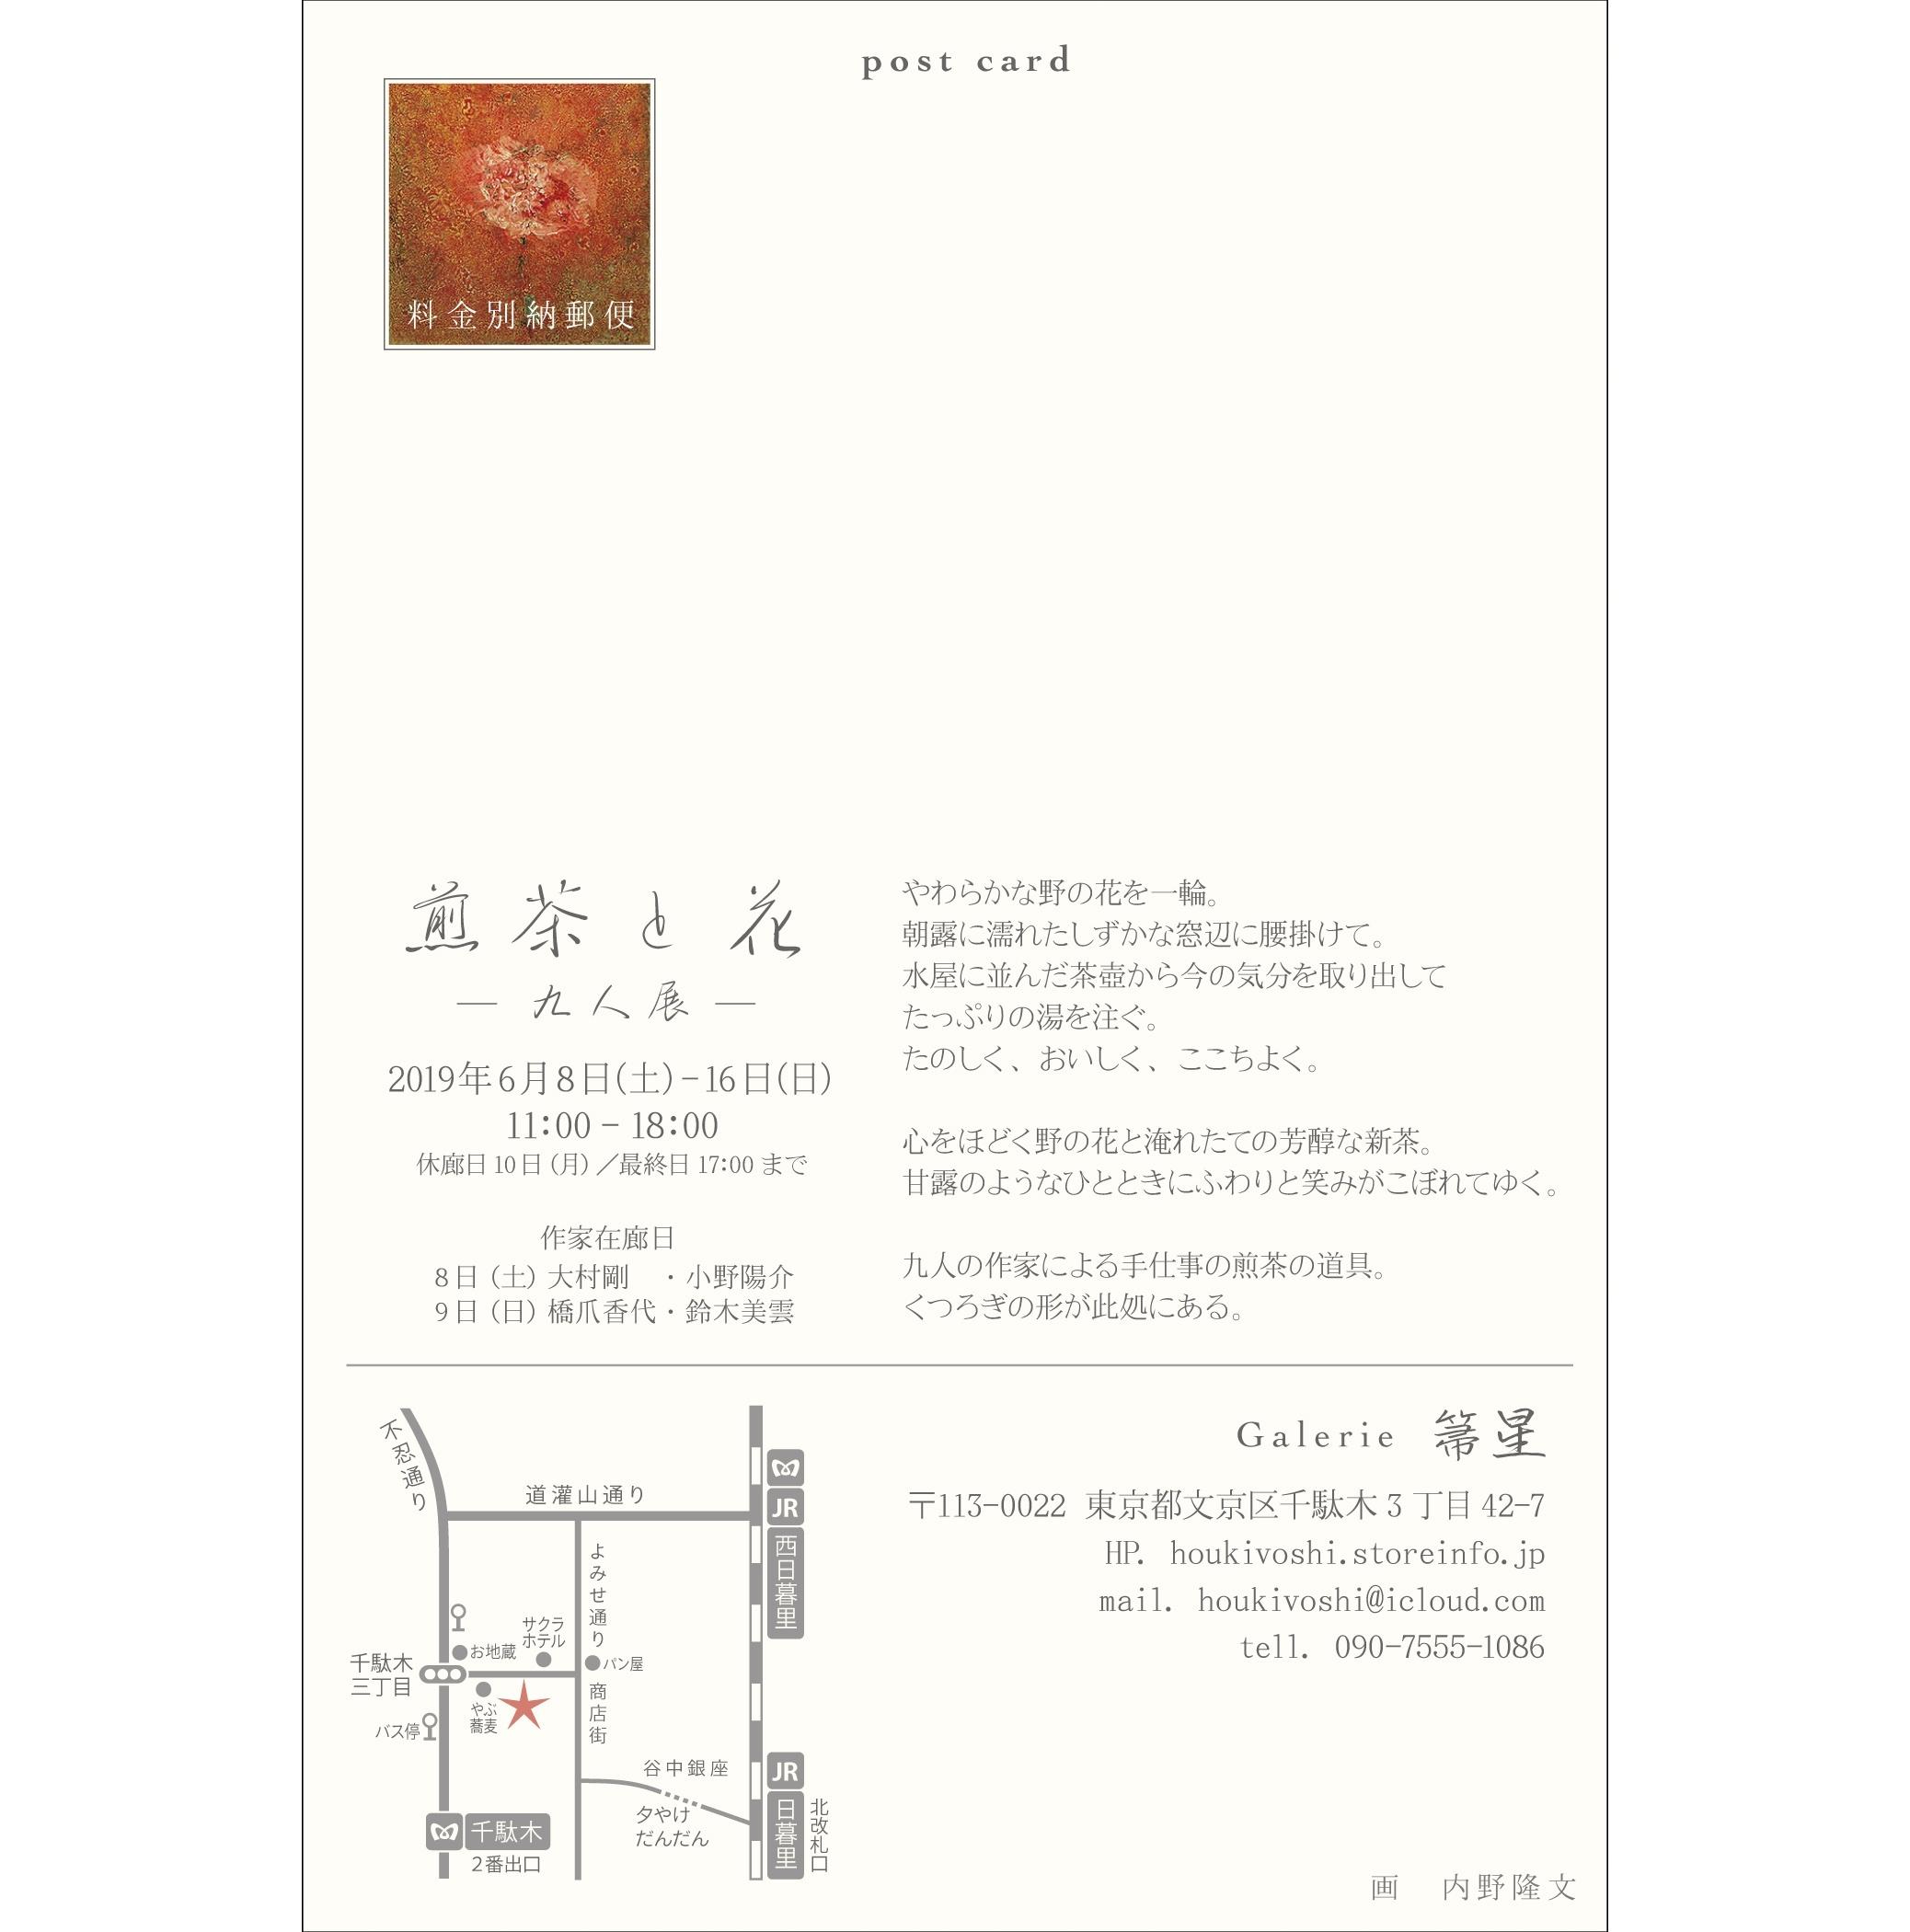 煎茶と花 - 九人展 -_f0351305_14264484.jpeg